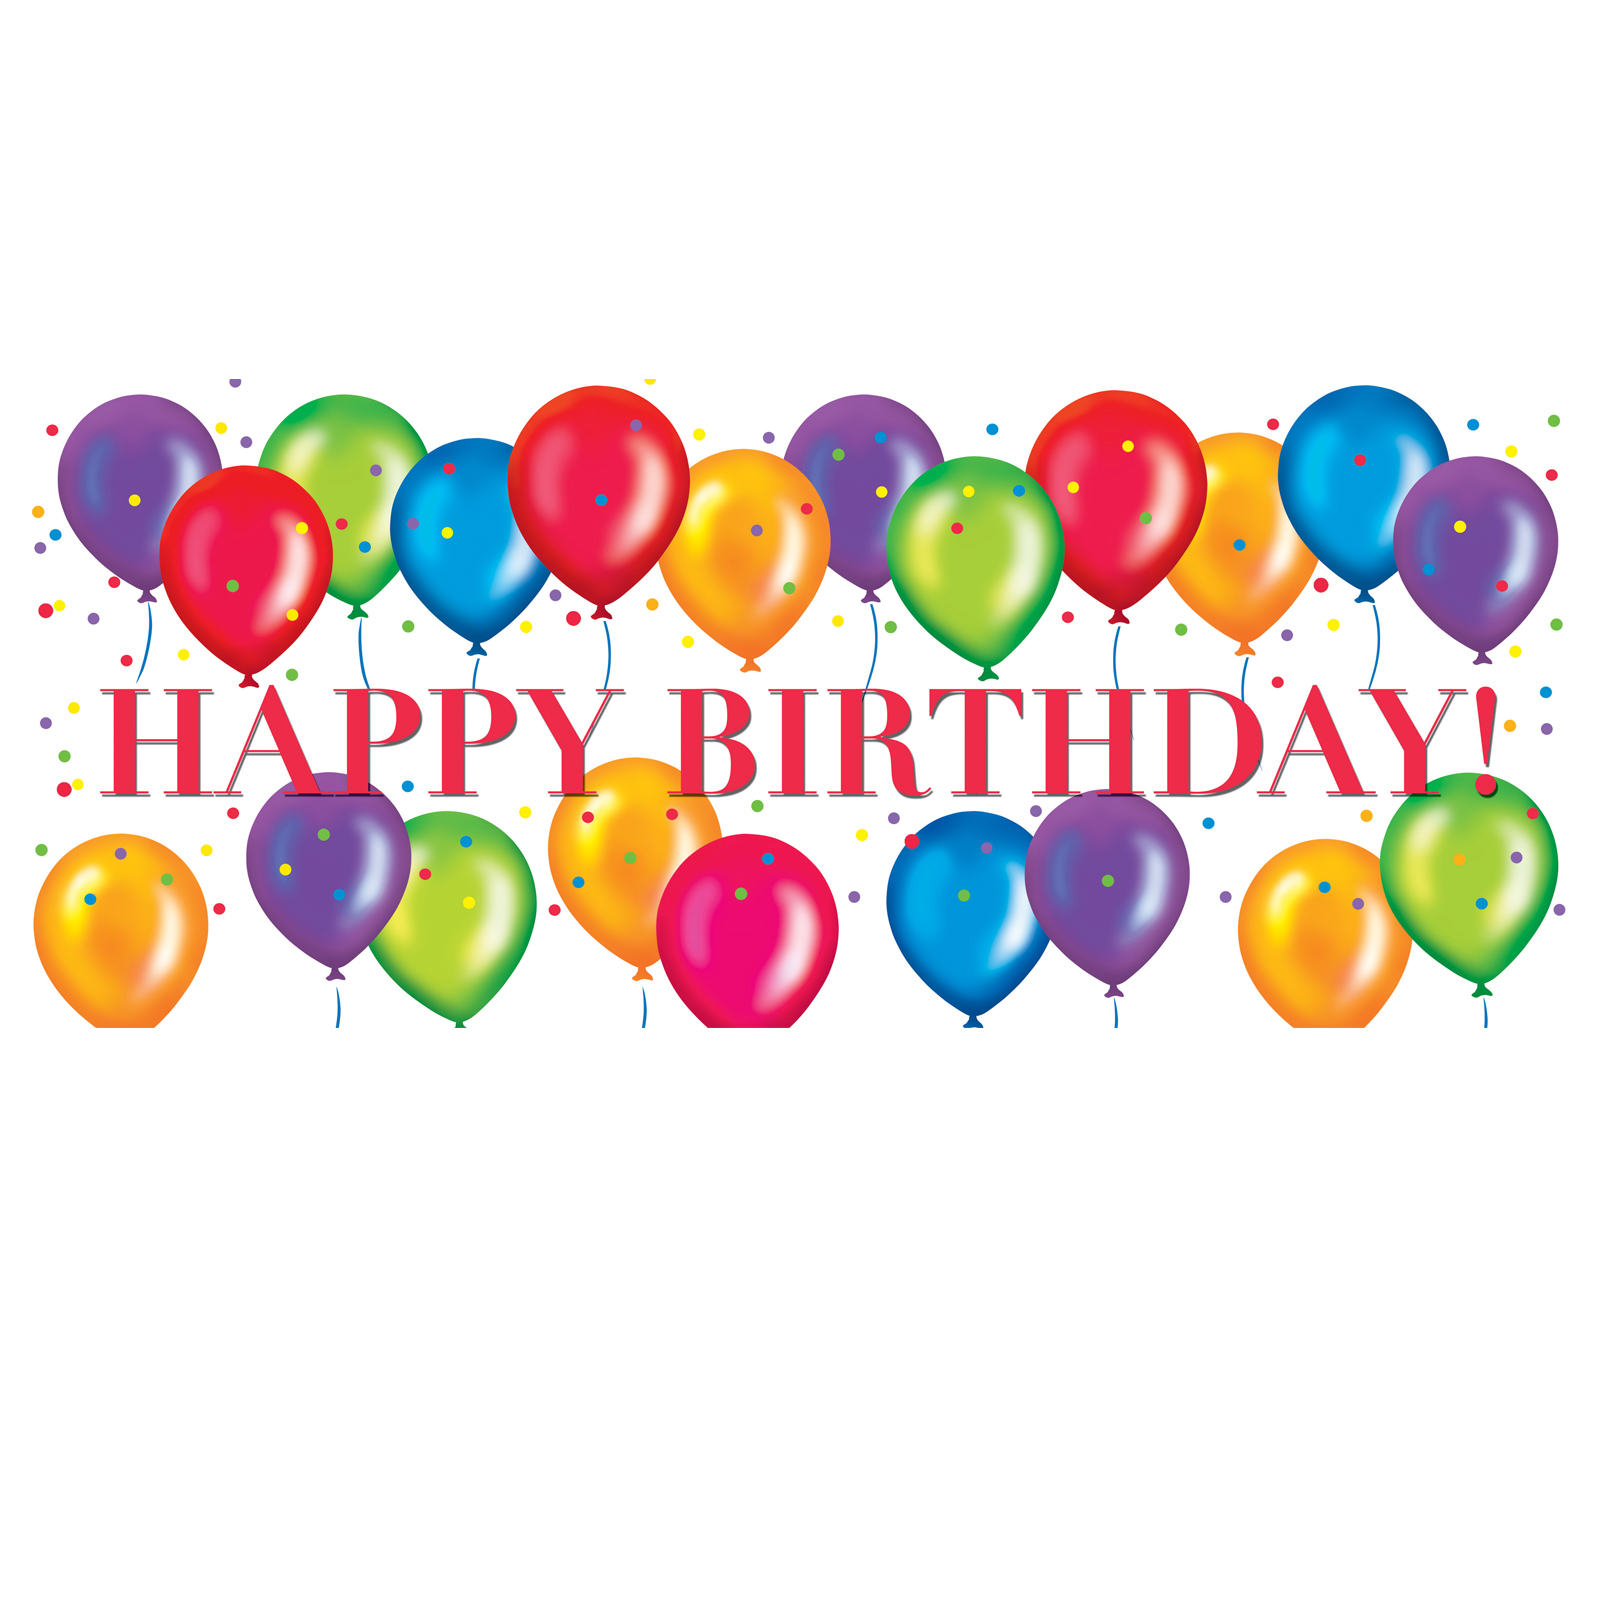 Happy birthday clipart free - ClipartFest